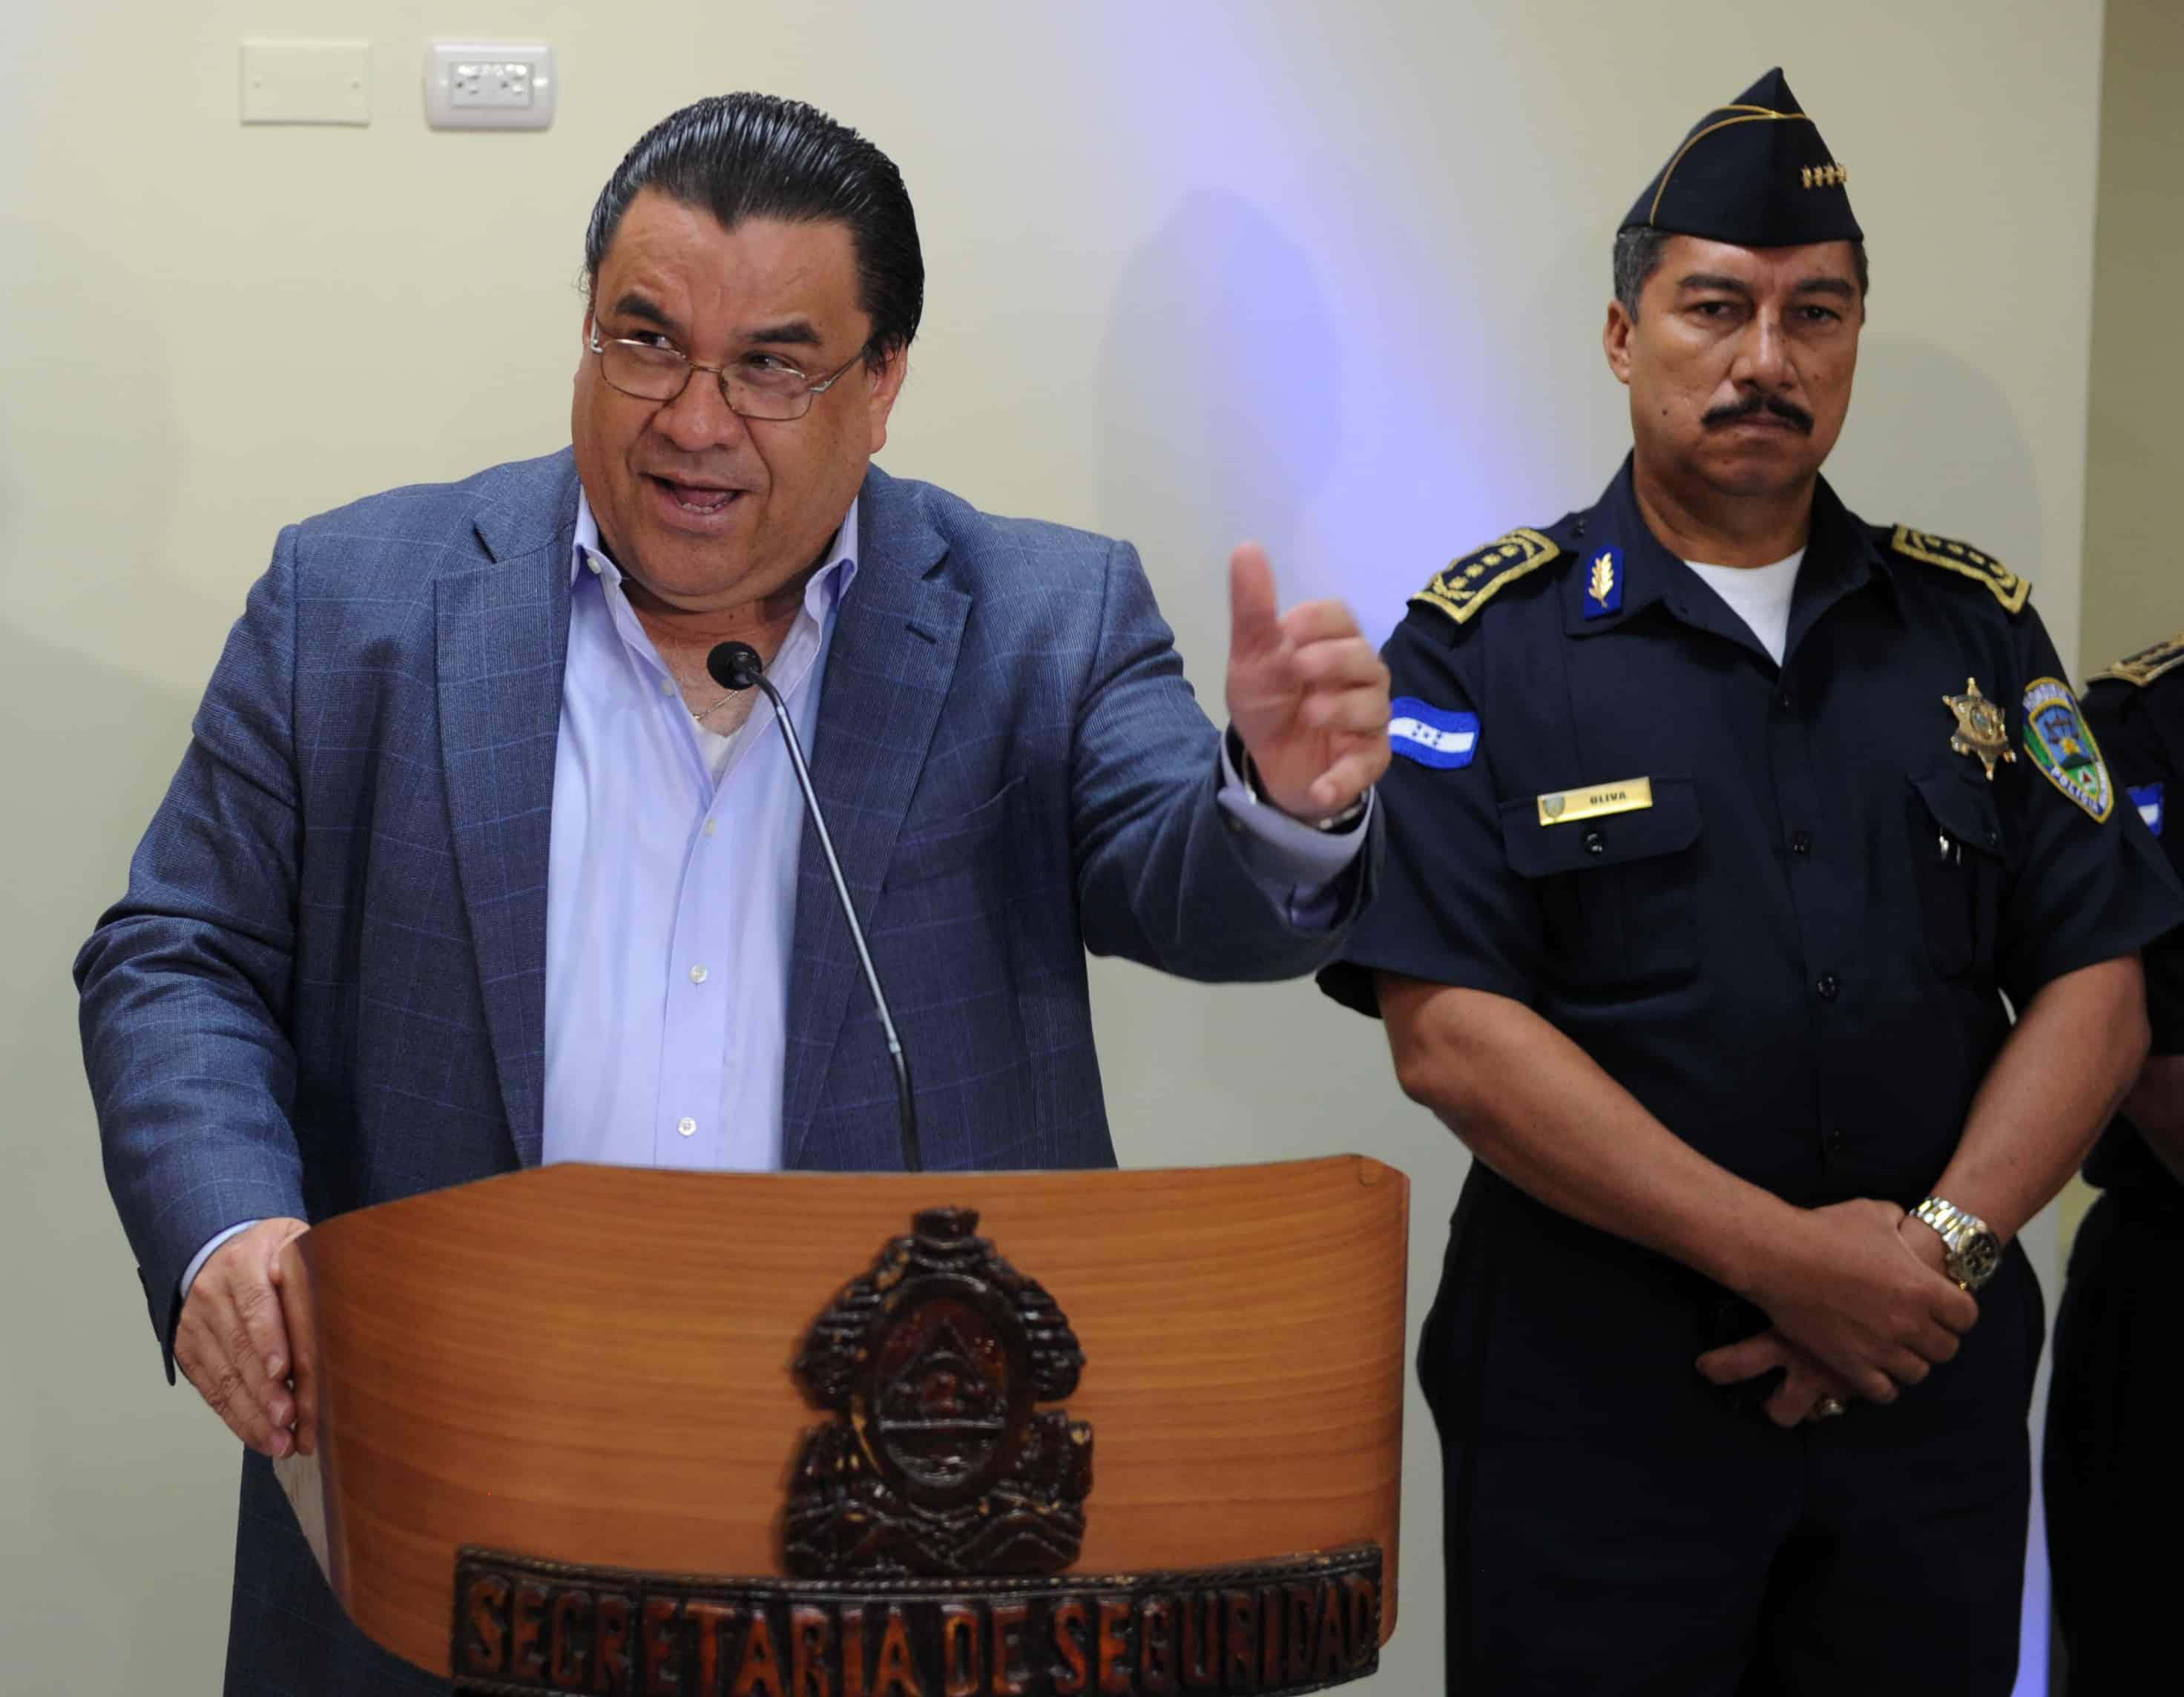 former Honduras Security Minister Arturo Corrales